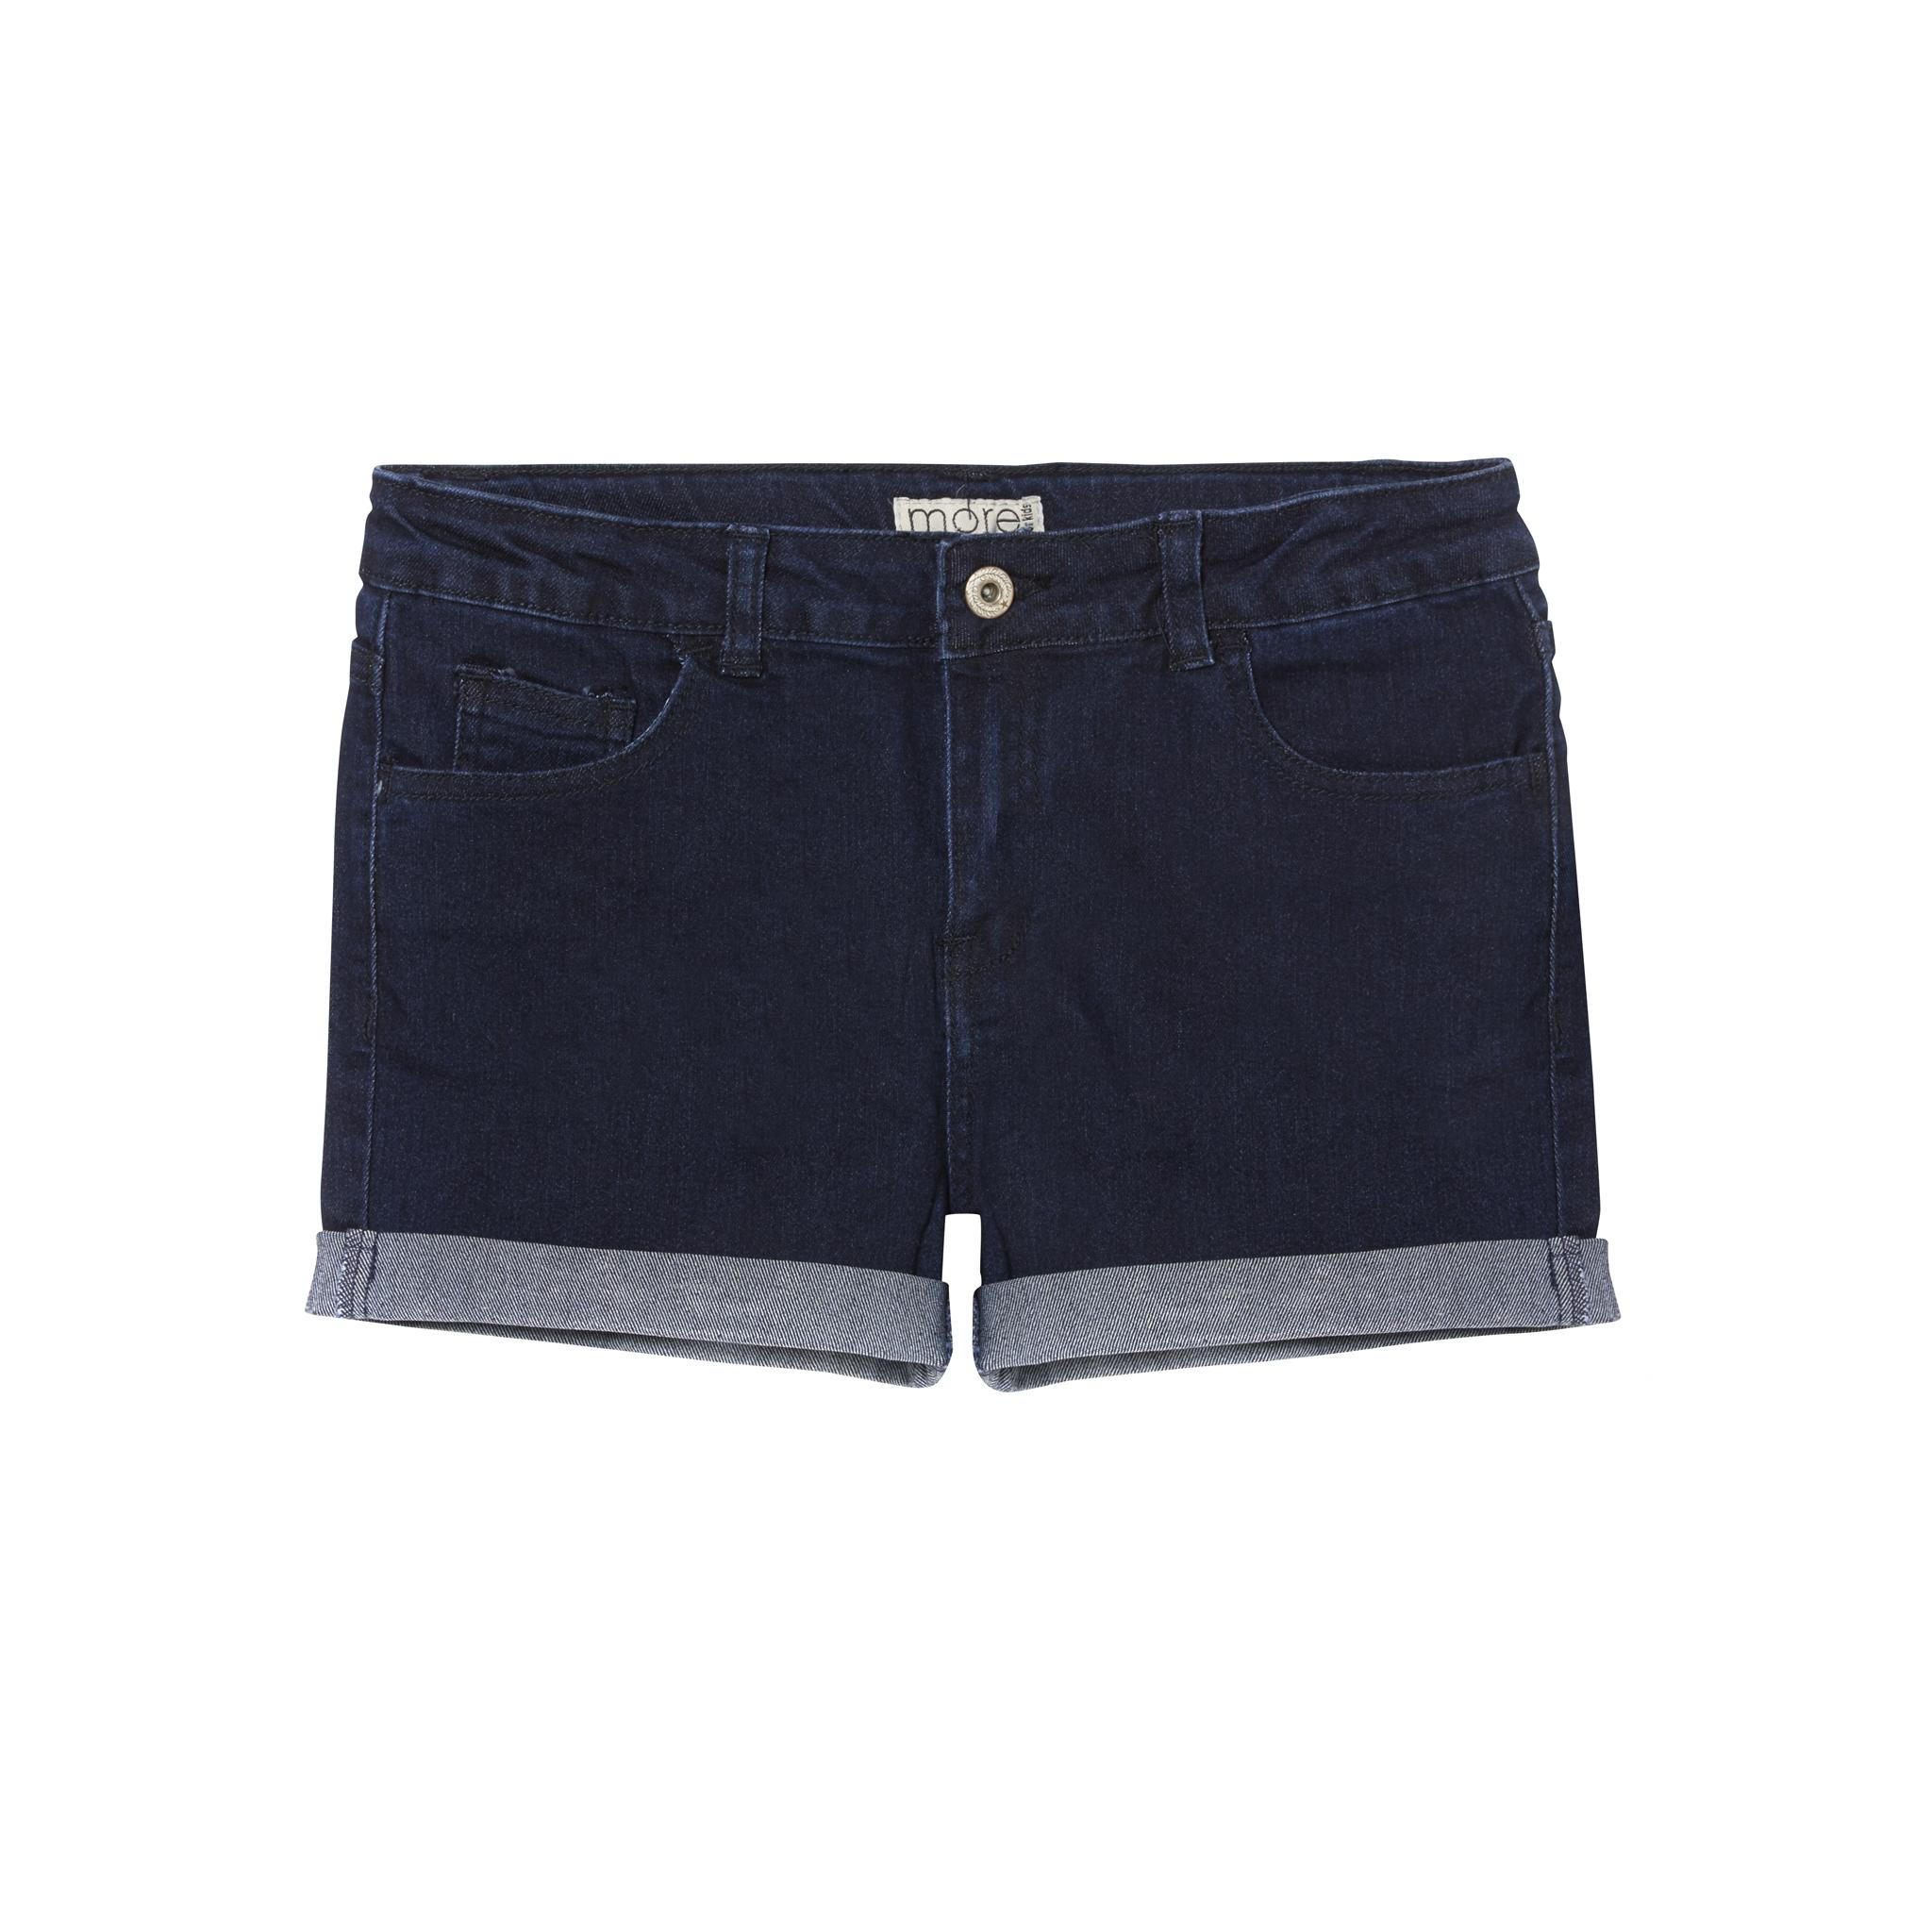 30473554 Dark Blue Plus Size, Adjustable Cuff Girls Shorts, Generous Fit   22 ...